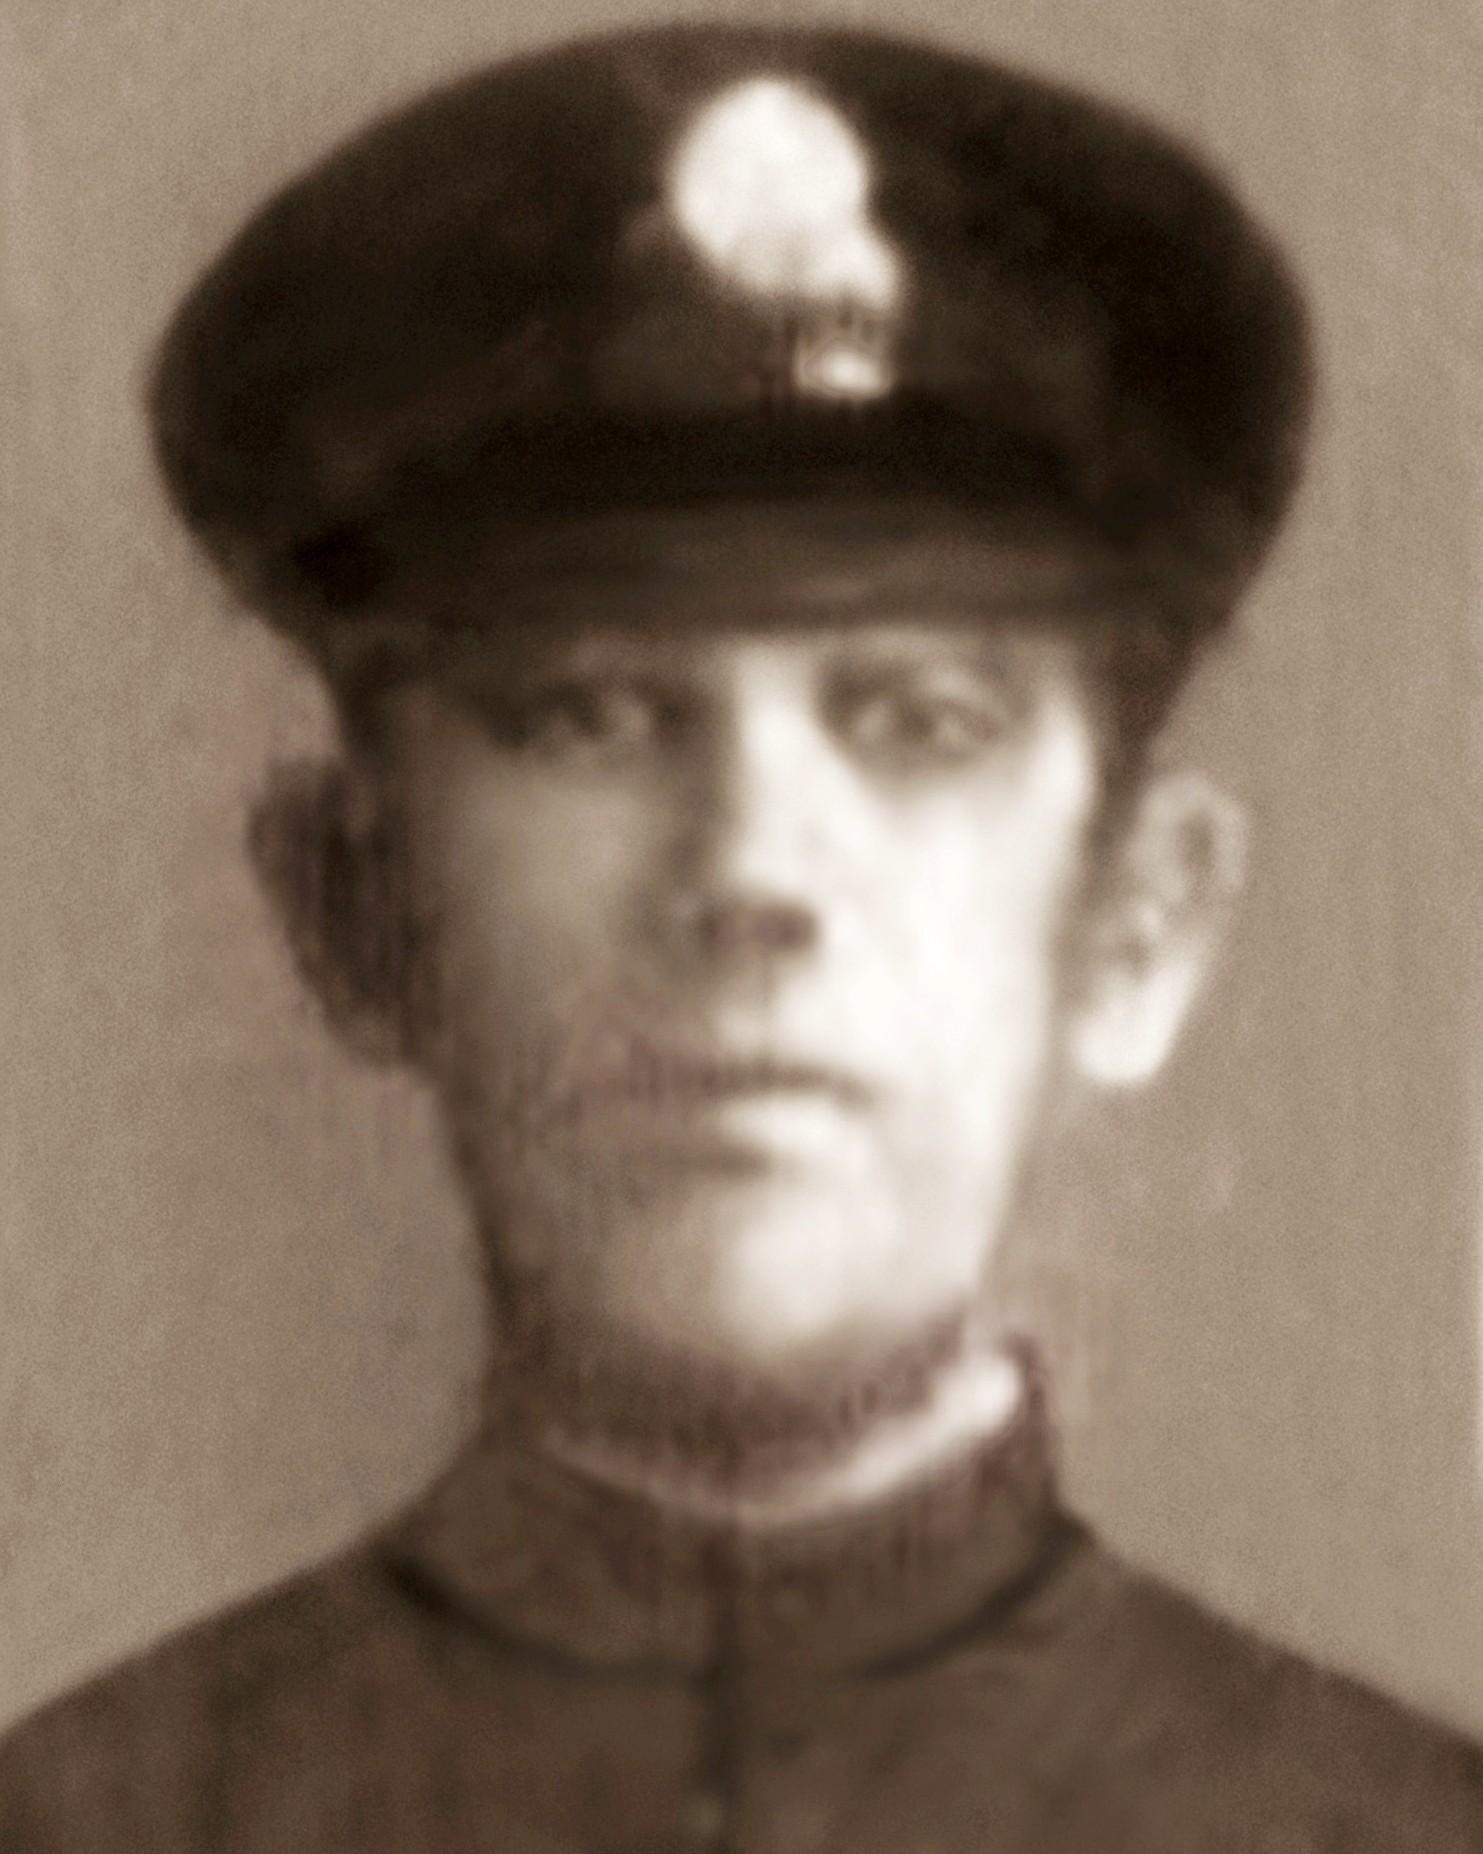 Patrol Officer Matthew J. McNally | Waterbury Police Department, Connecticut